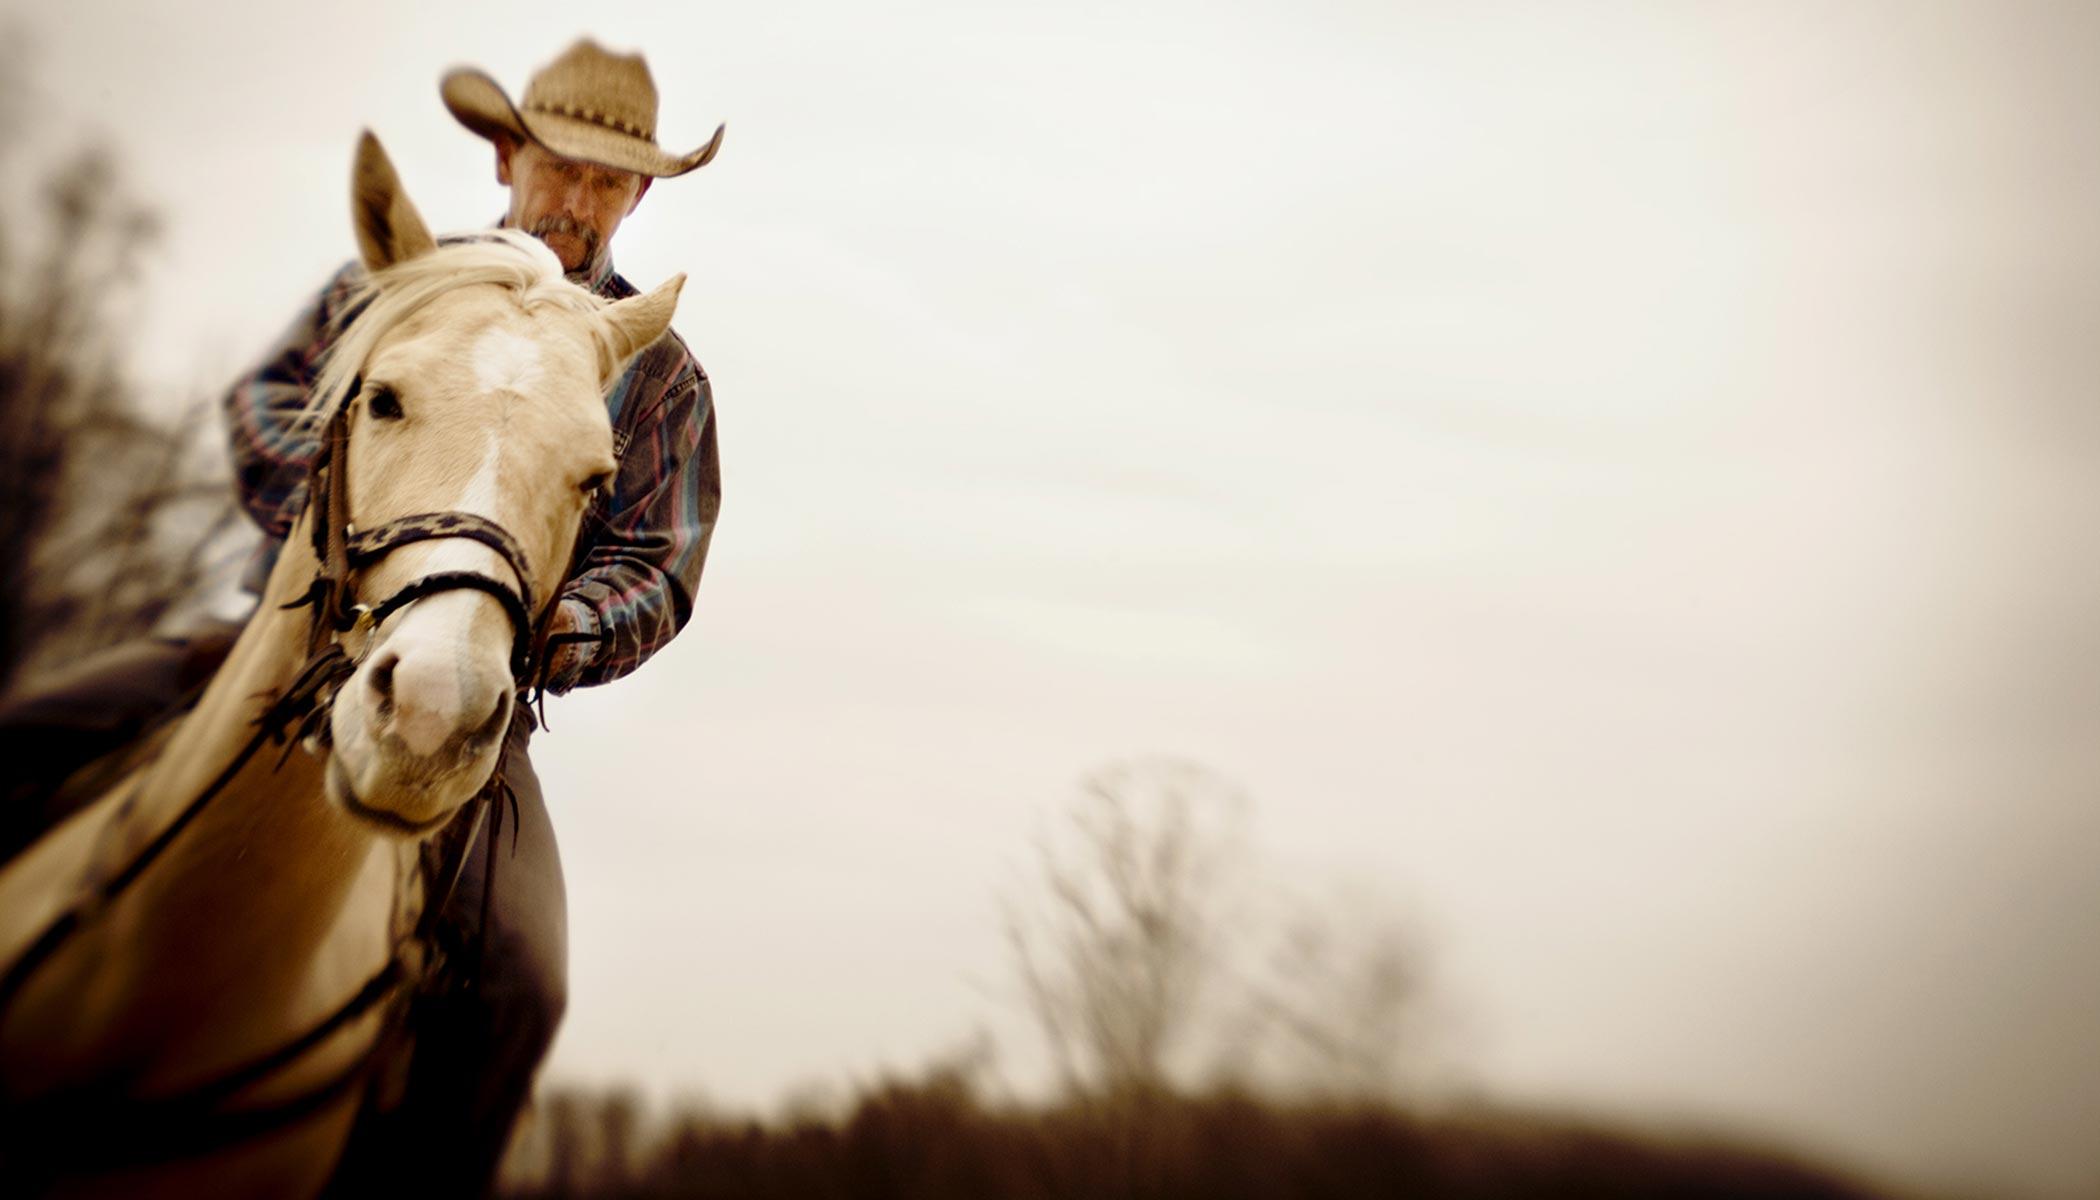 Life-marlboro-man-horse-cowboy